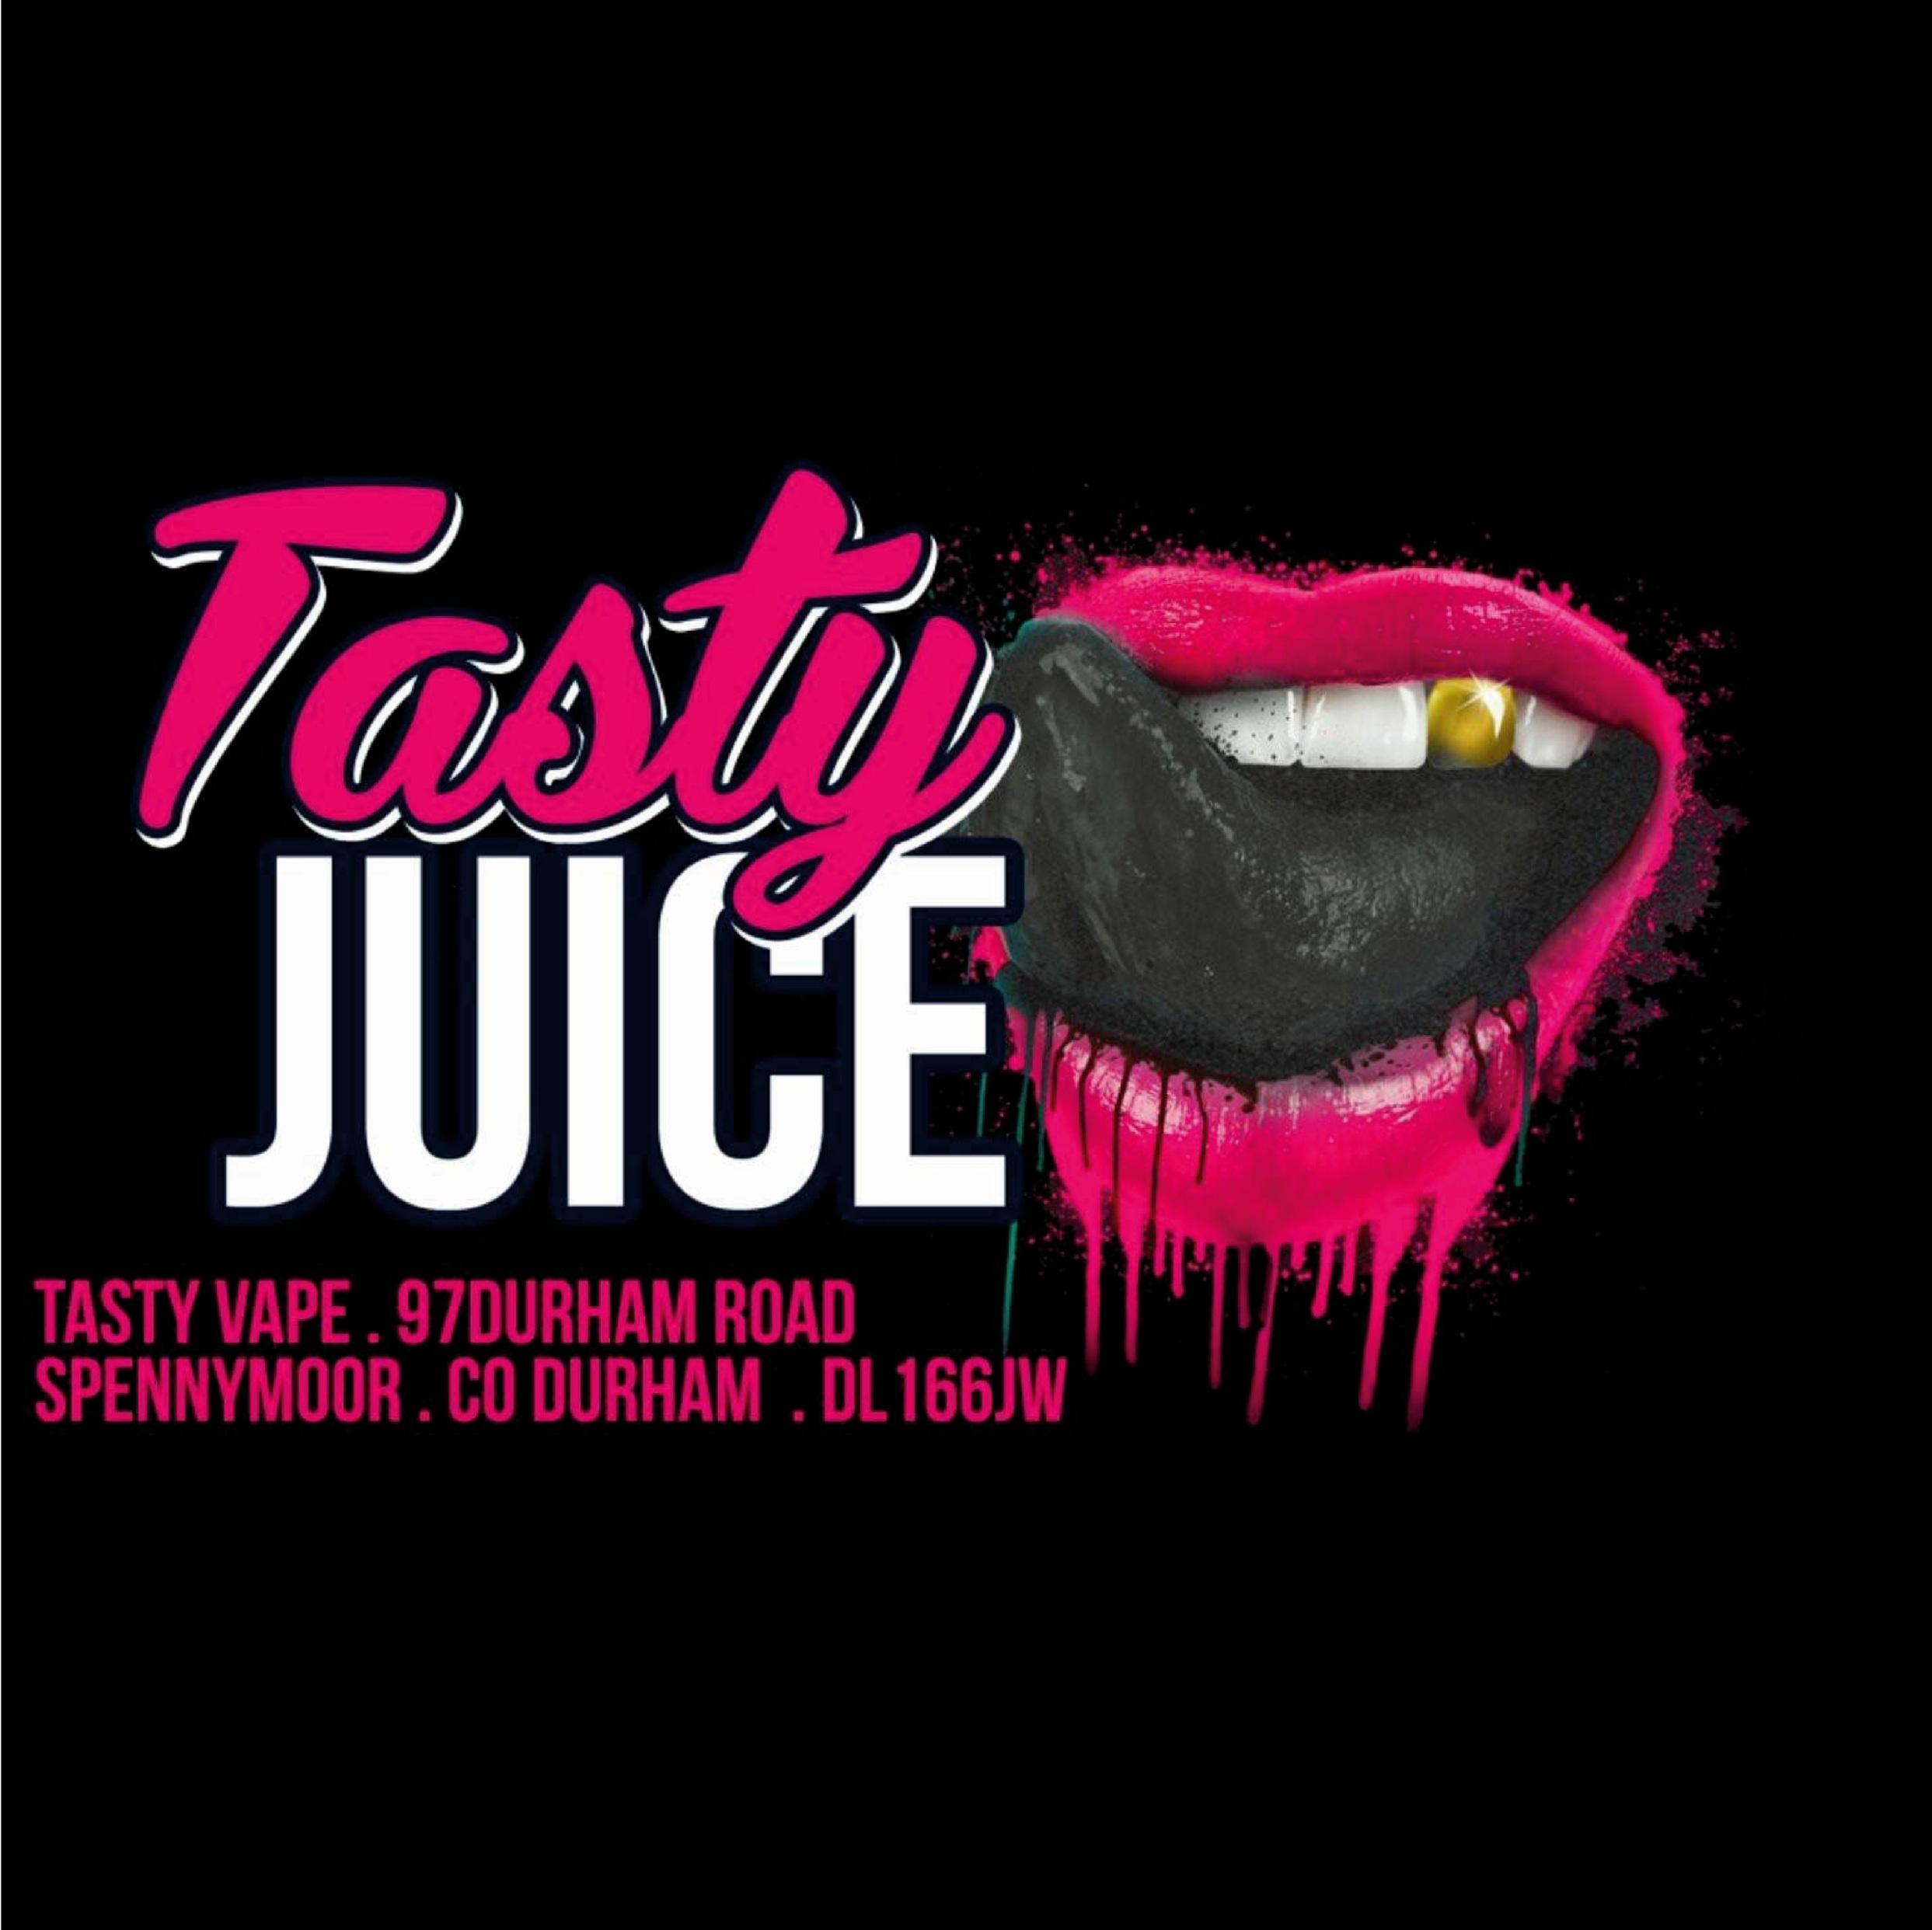 Tasty Vape